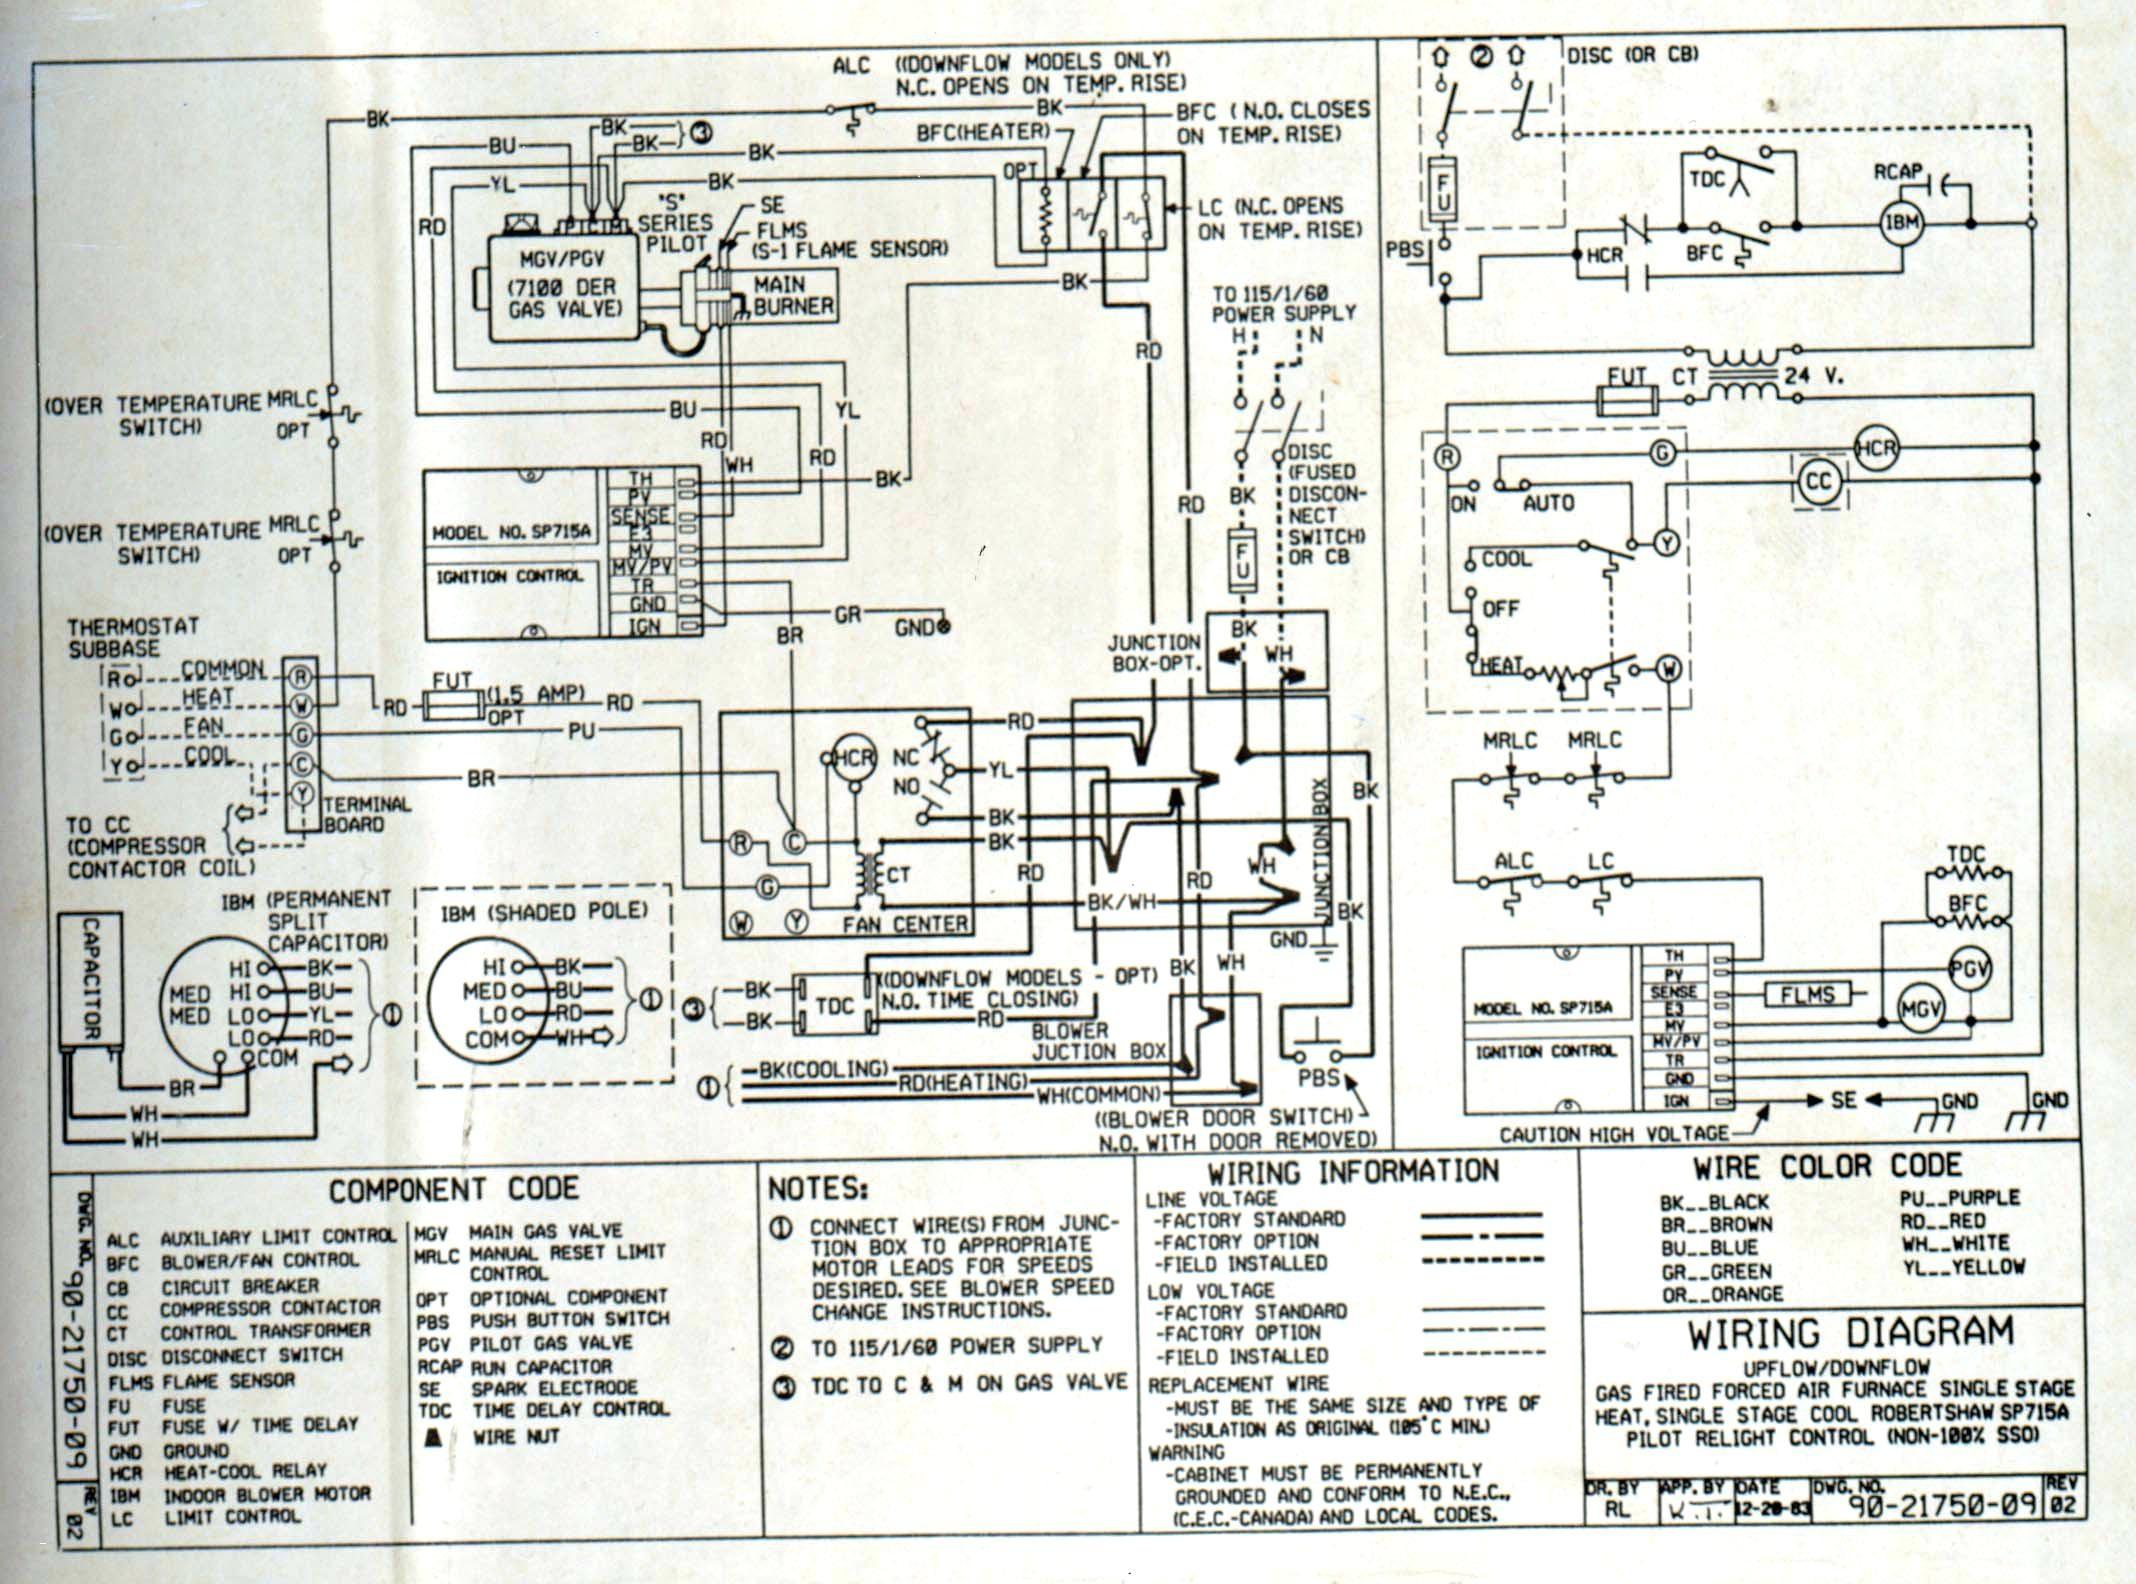 pictorial diagram goodman hvac wiring diagram database u2022 rh 149 28 104 159 Electrical Schematic Symbols House Electrical Schematics